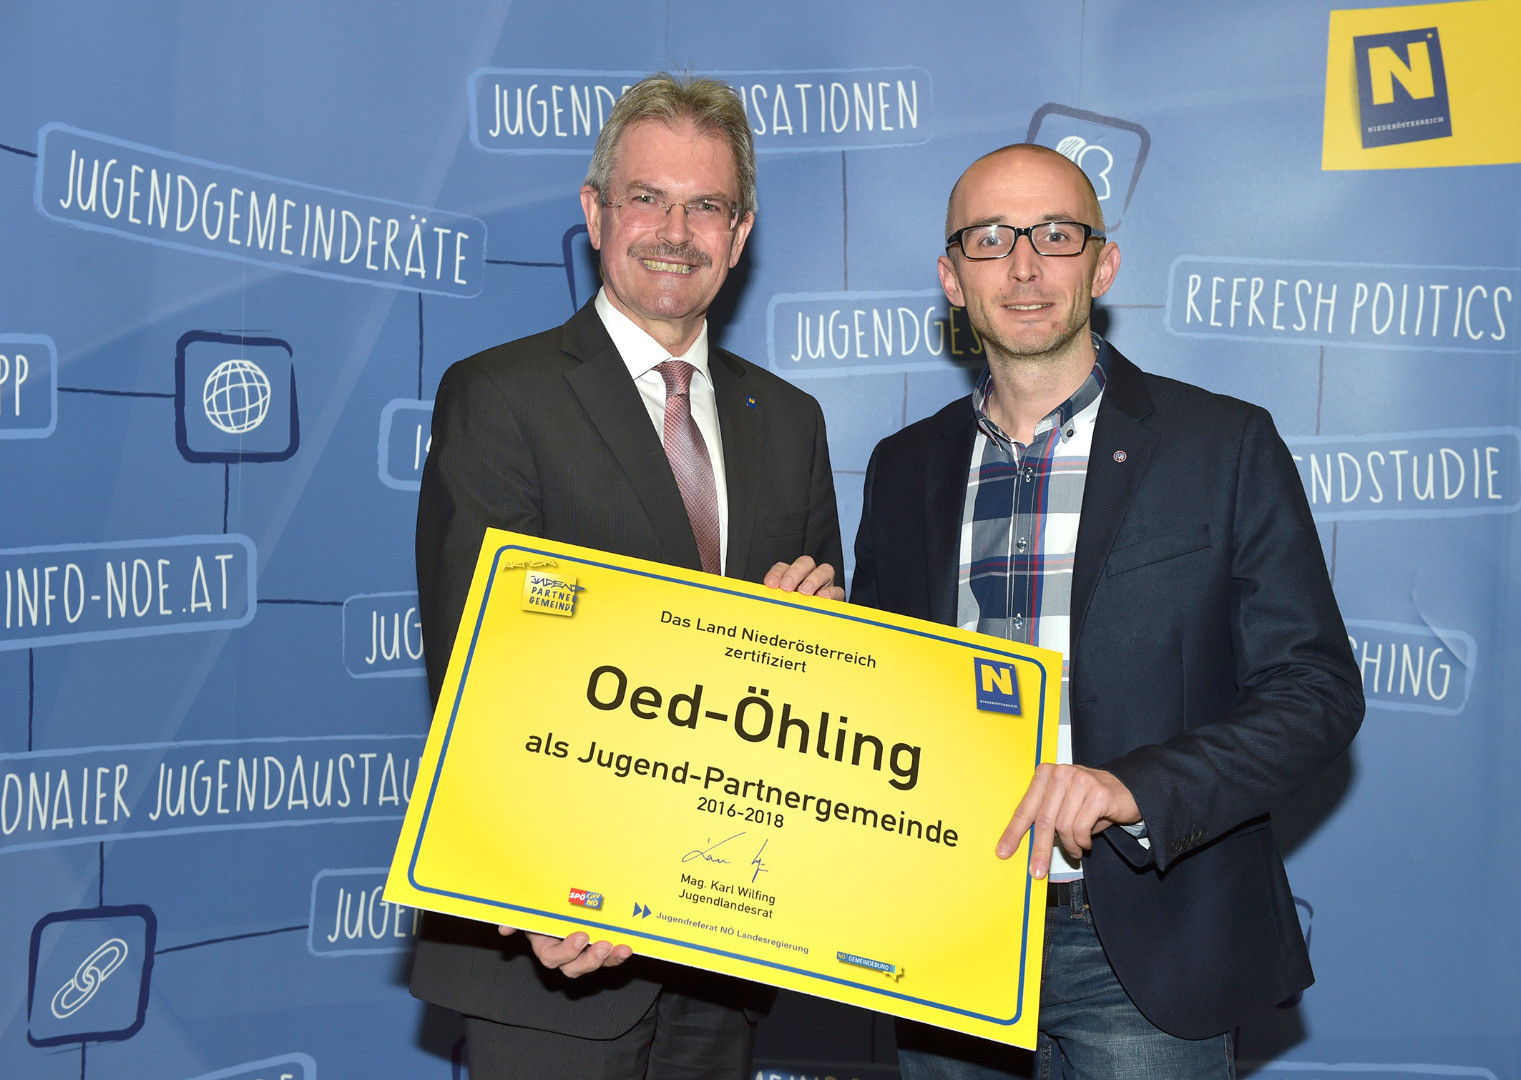 Oed_Öhling_COPYRIGHT NLK Johann Pfeiffer.jpg